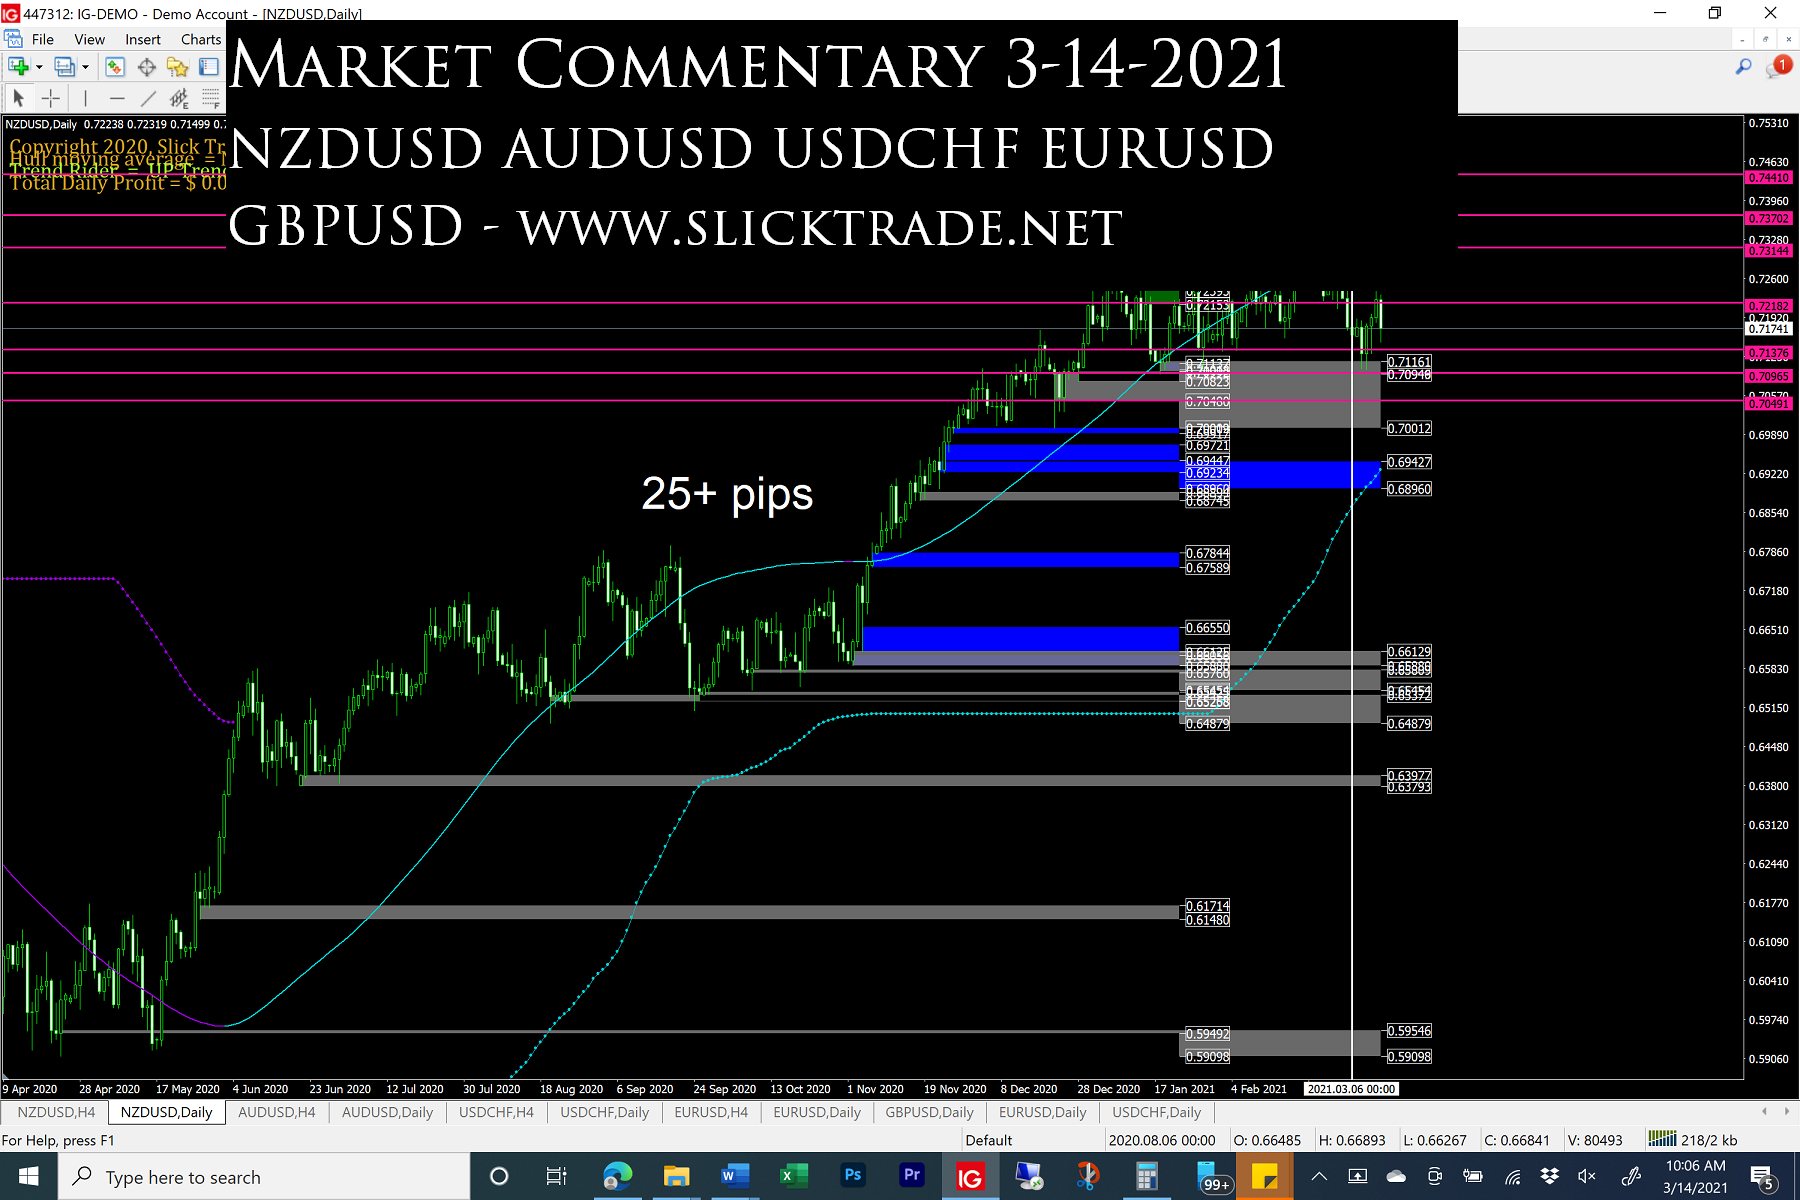 Market Commentary 3-14-2021 - NZDUSD AUDUSD USDCHF EURUSD GBPUSD